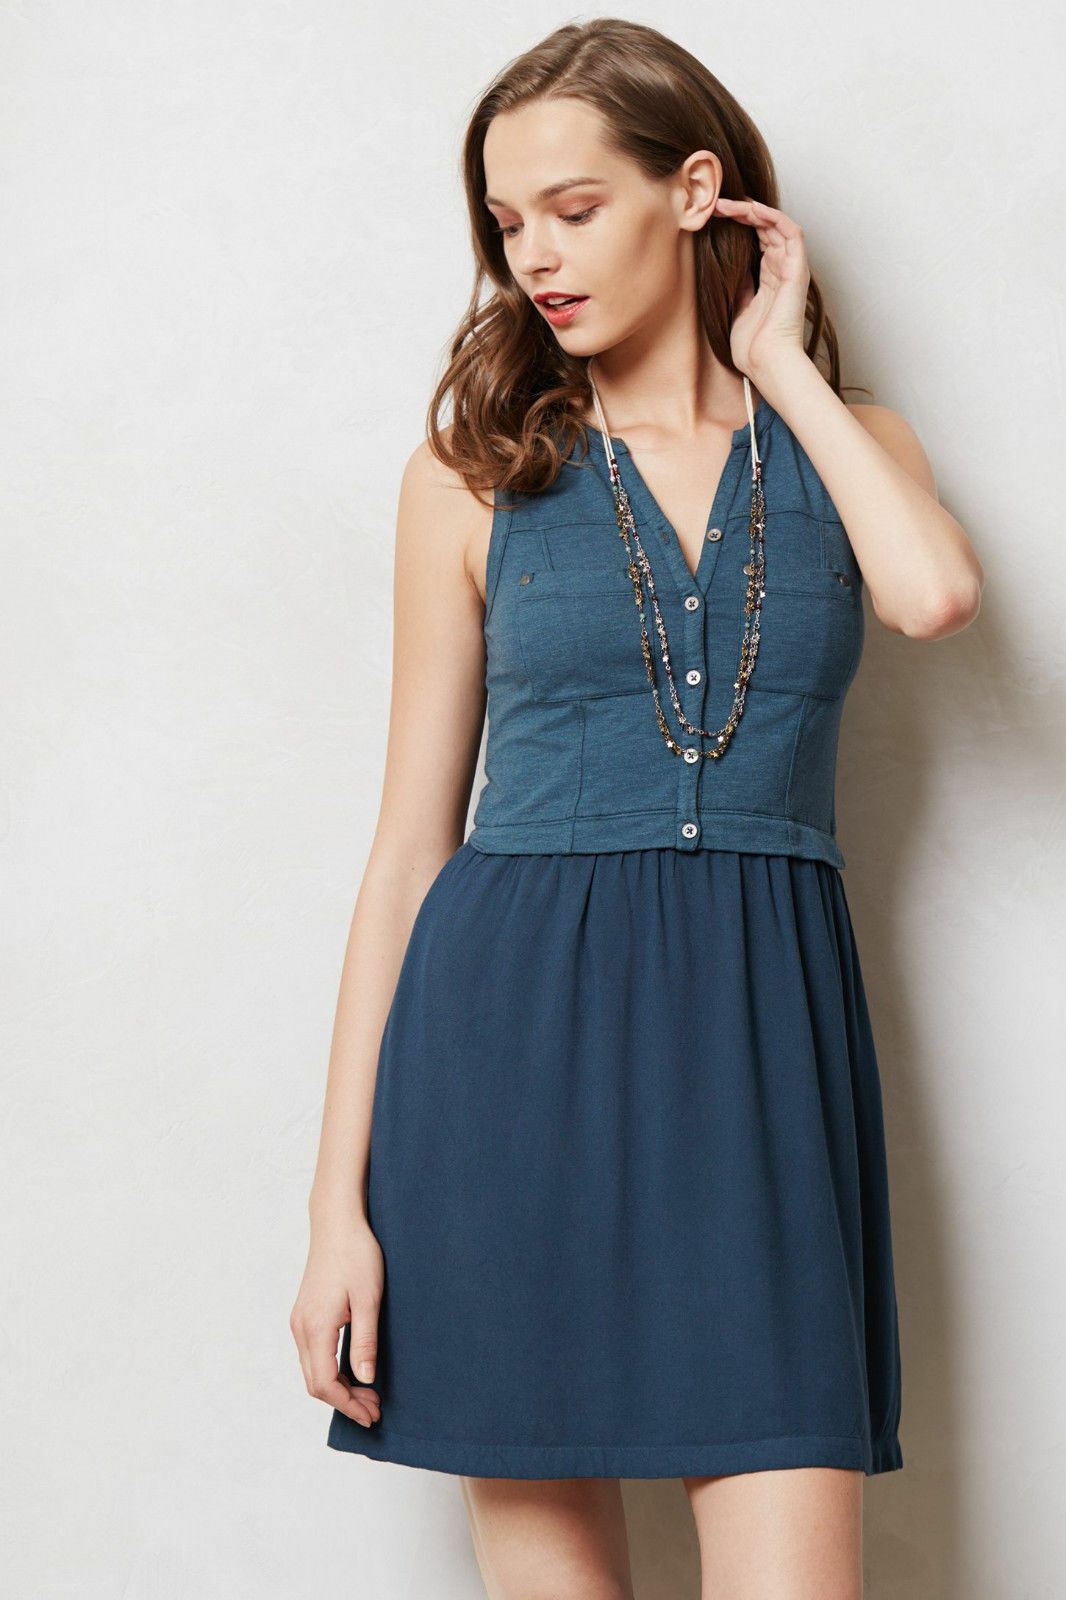 Anthropologie Dress Highway Day Shirtdress bluee Sleeveless Summer, Sizes M & L